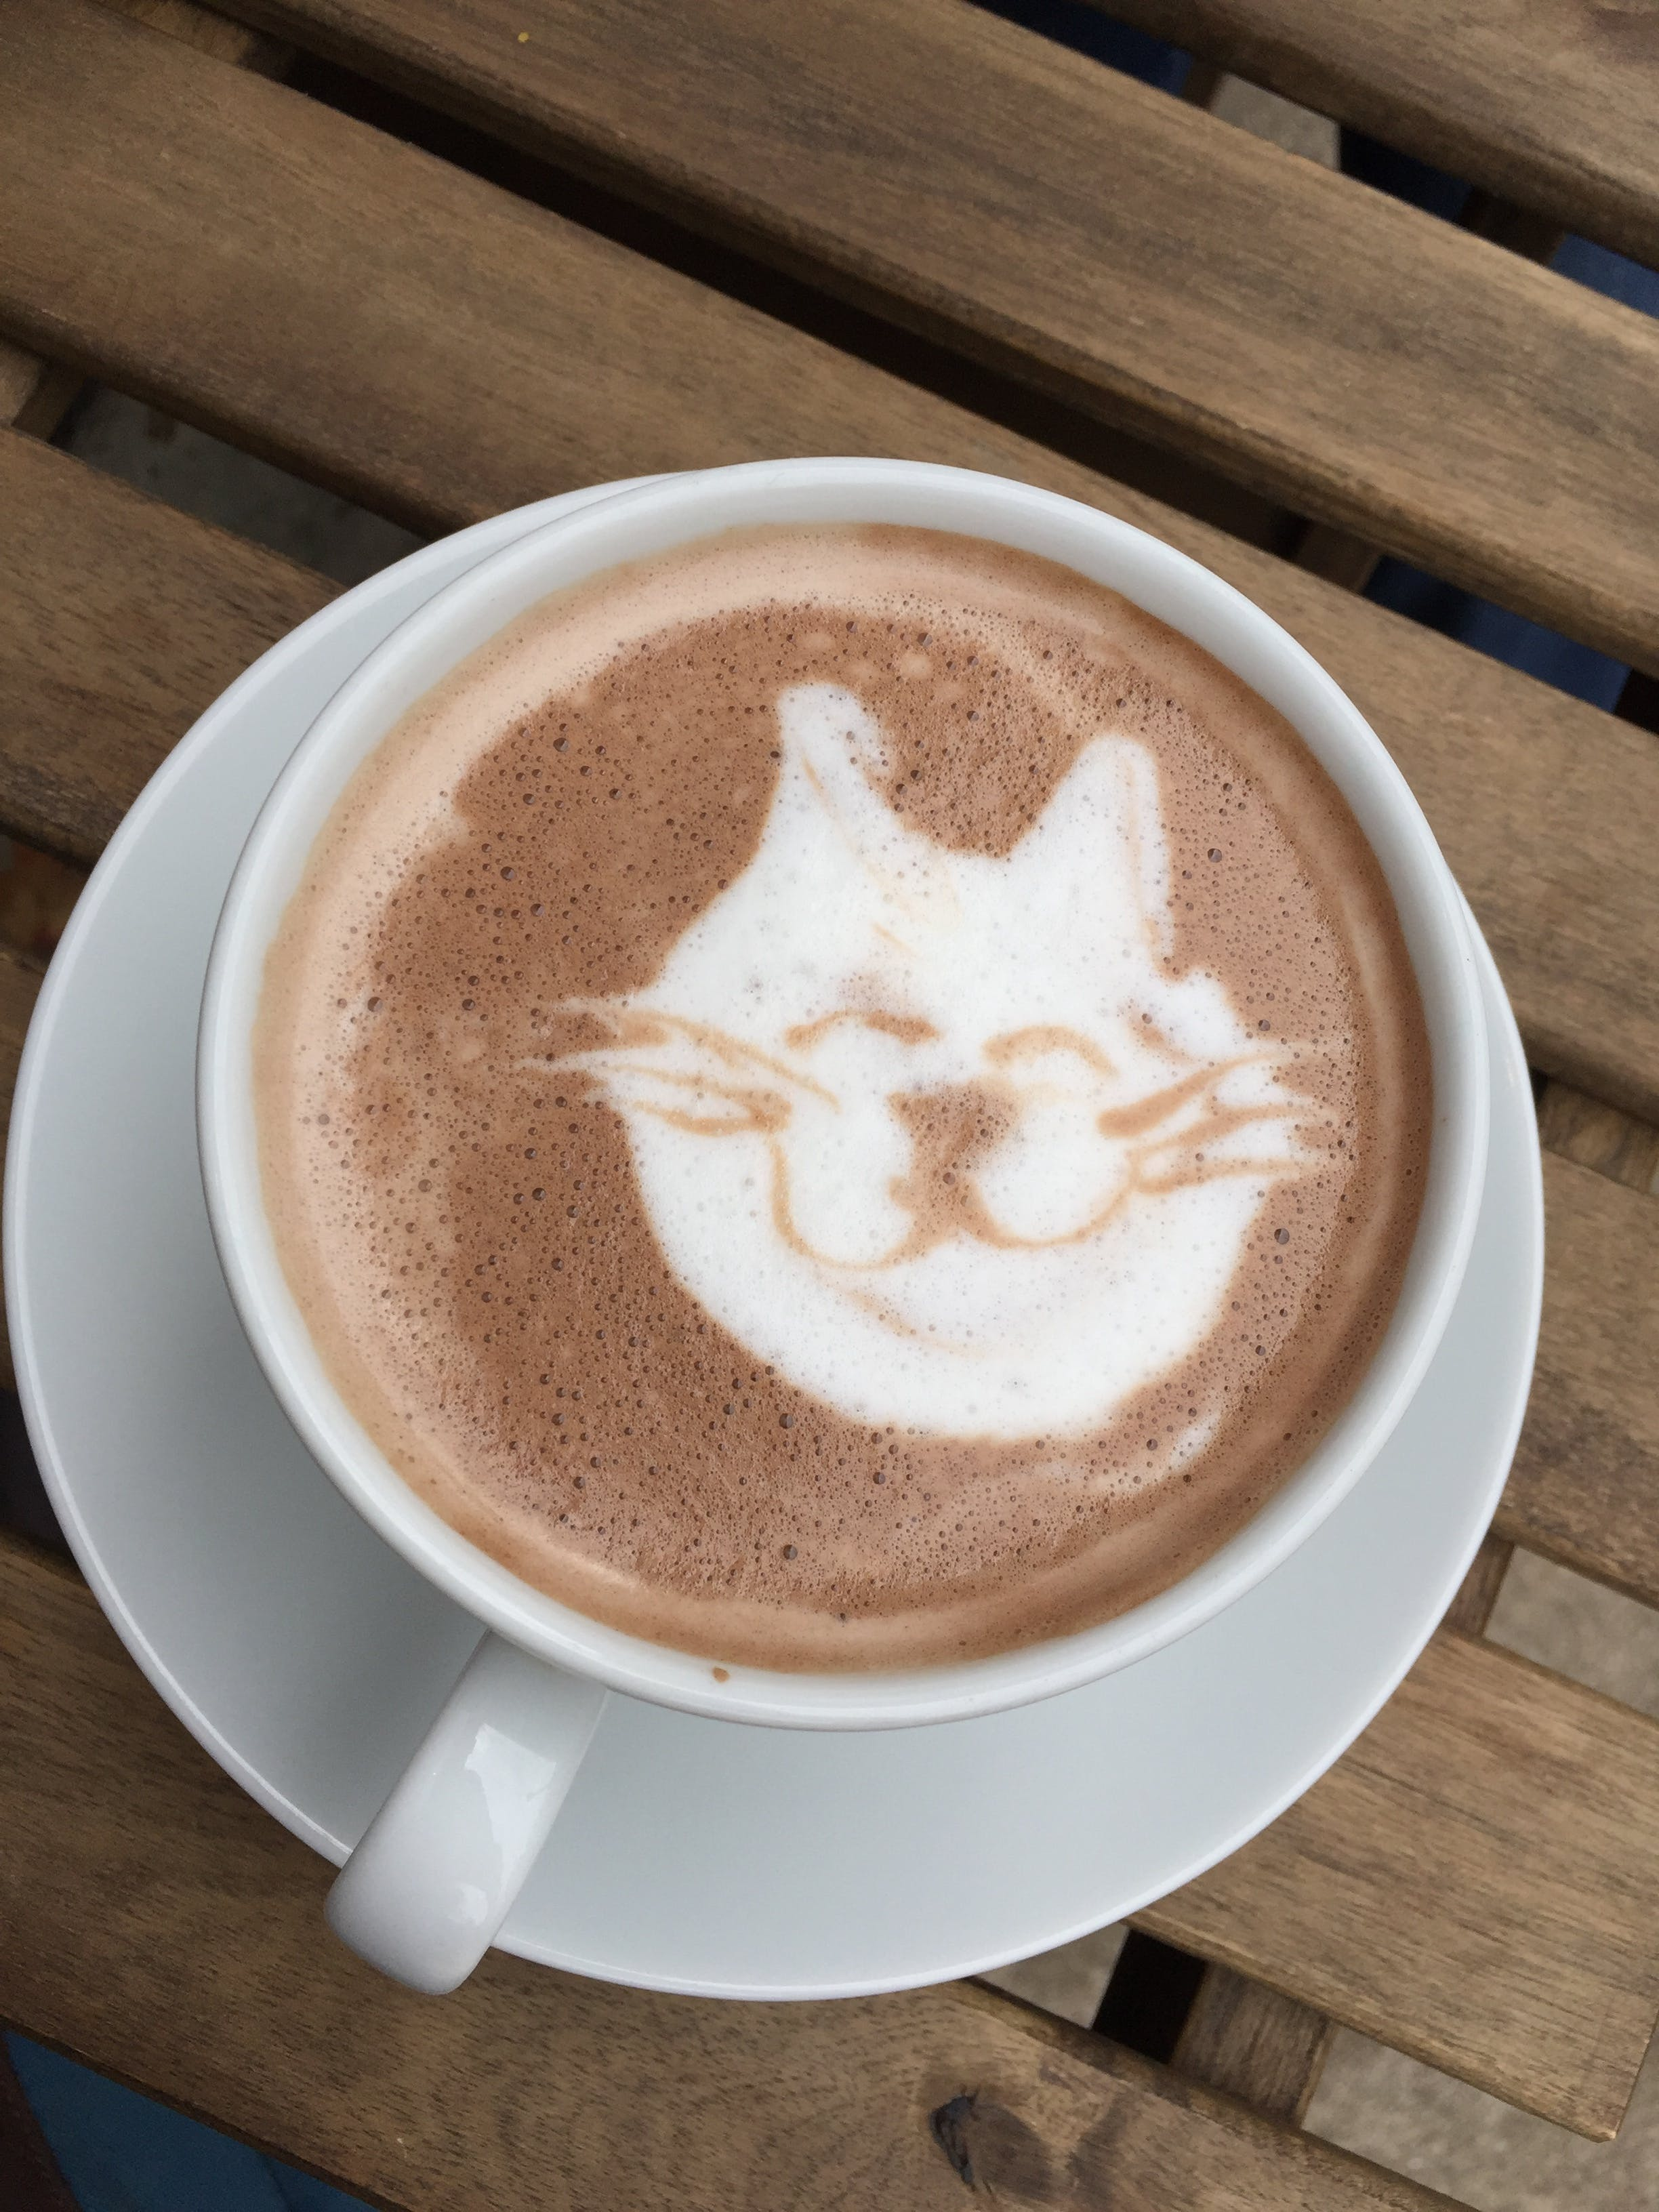 Free stock photo of coffee, chocolate, cat, latte